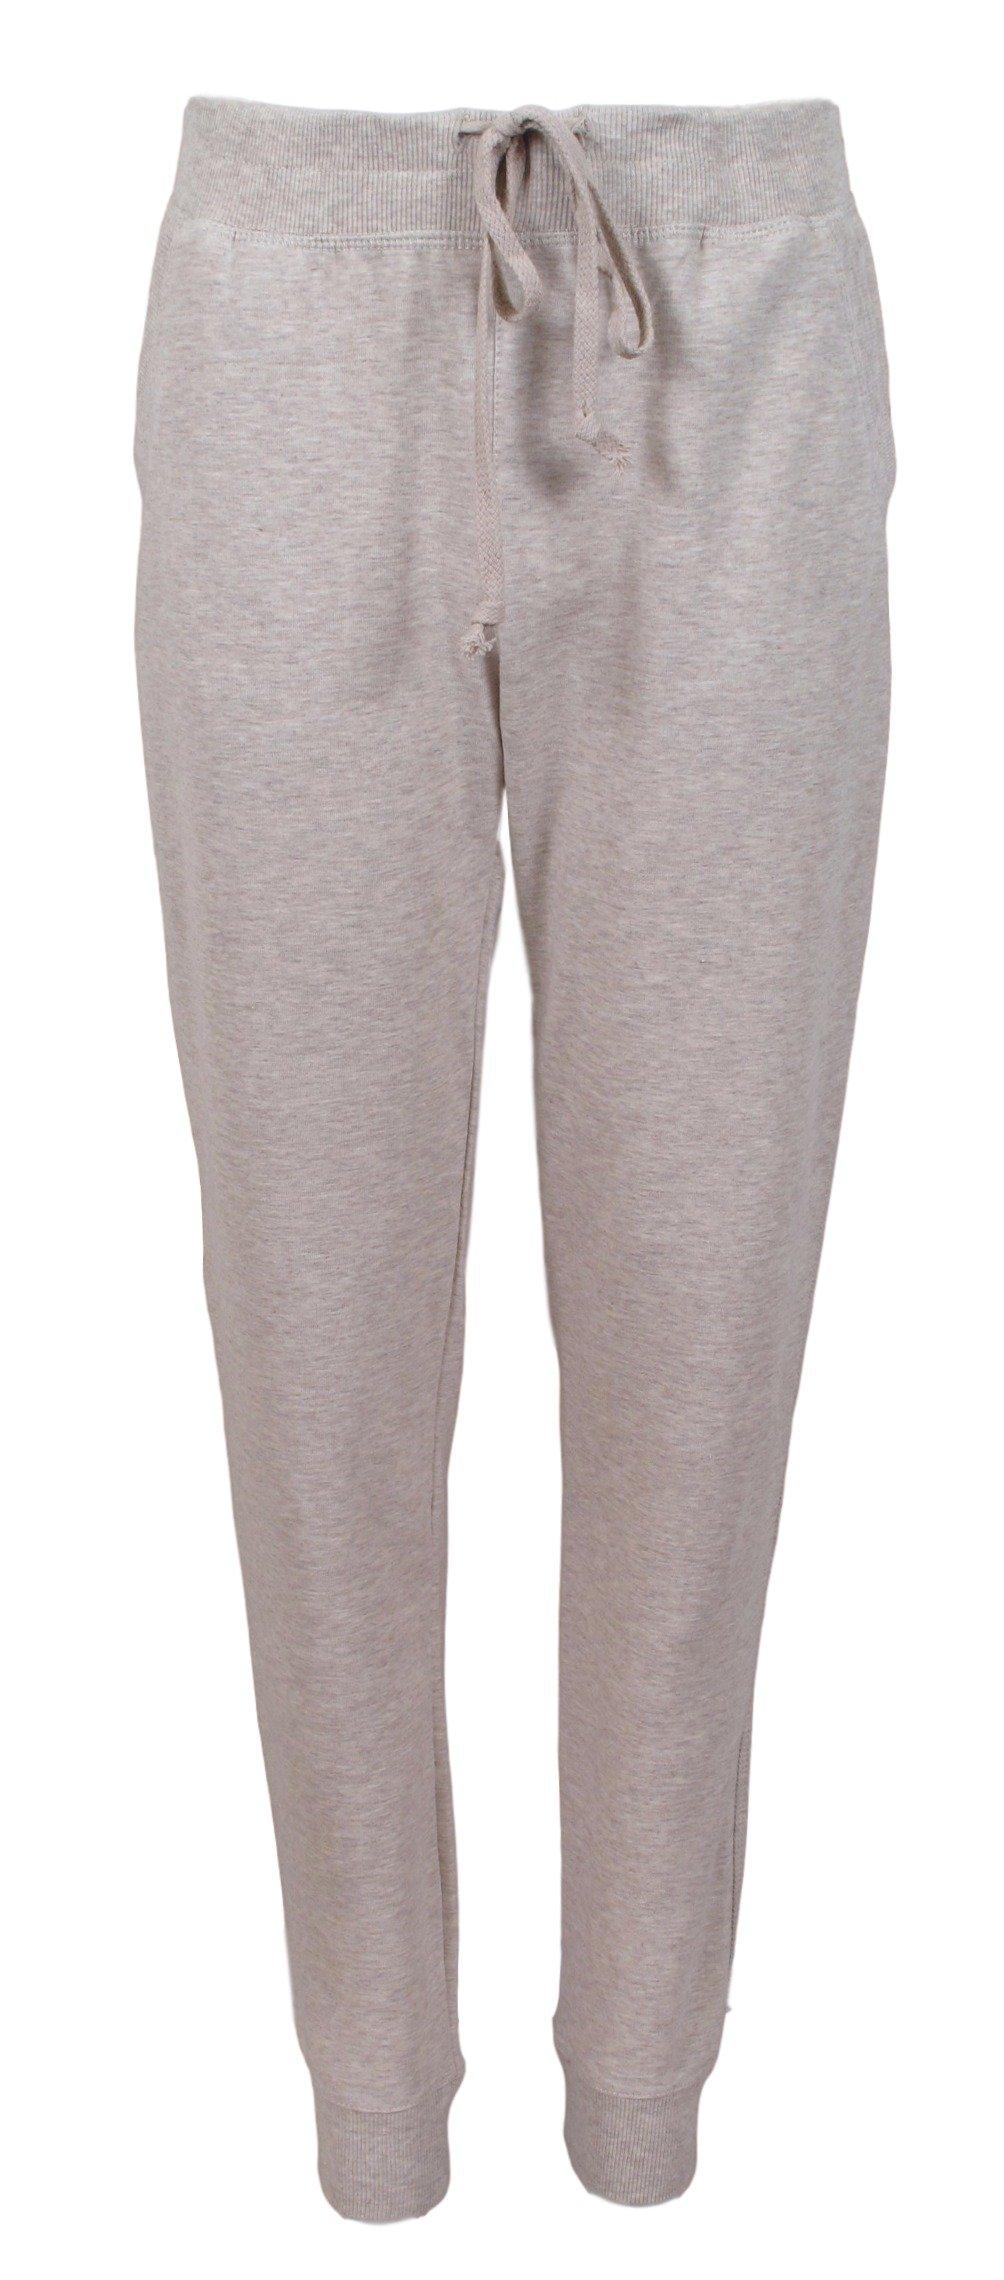 Ambiance Women's Juniors Soft Jogger Pants (M, Oatmeal)